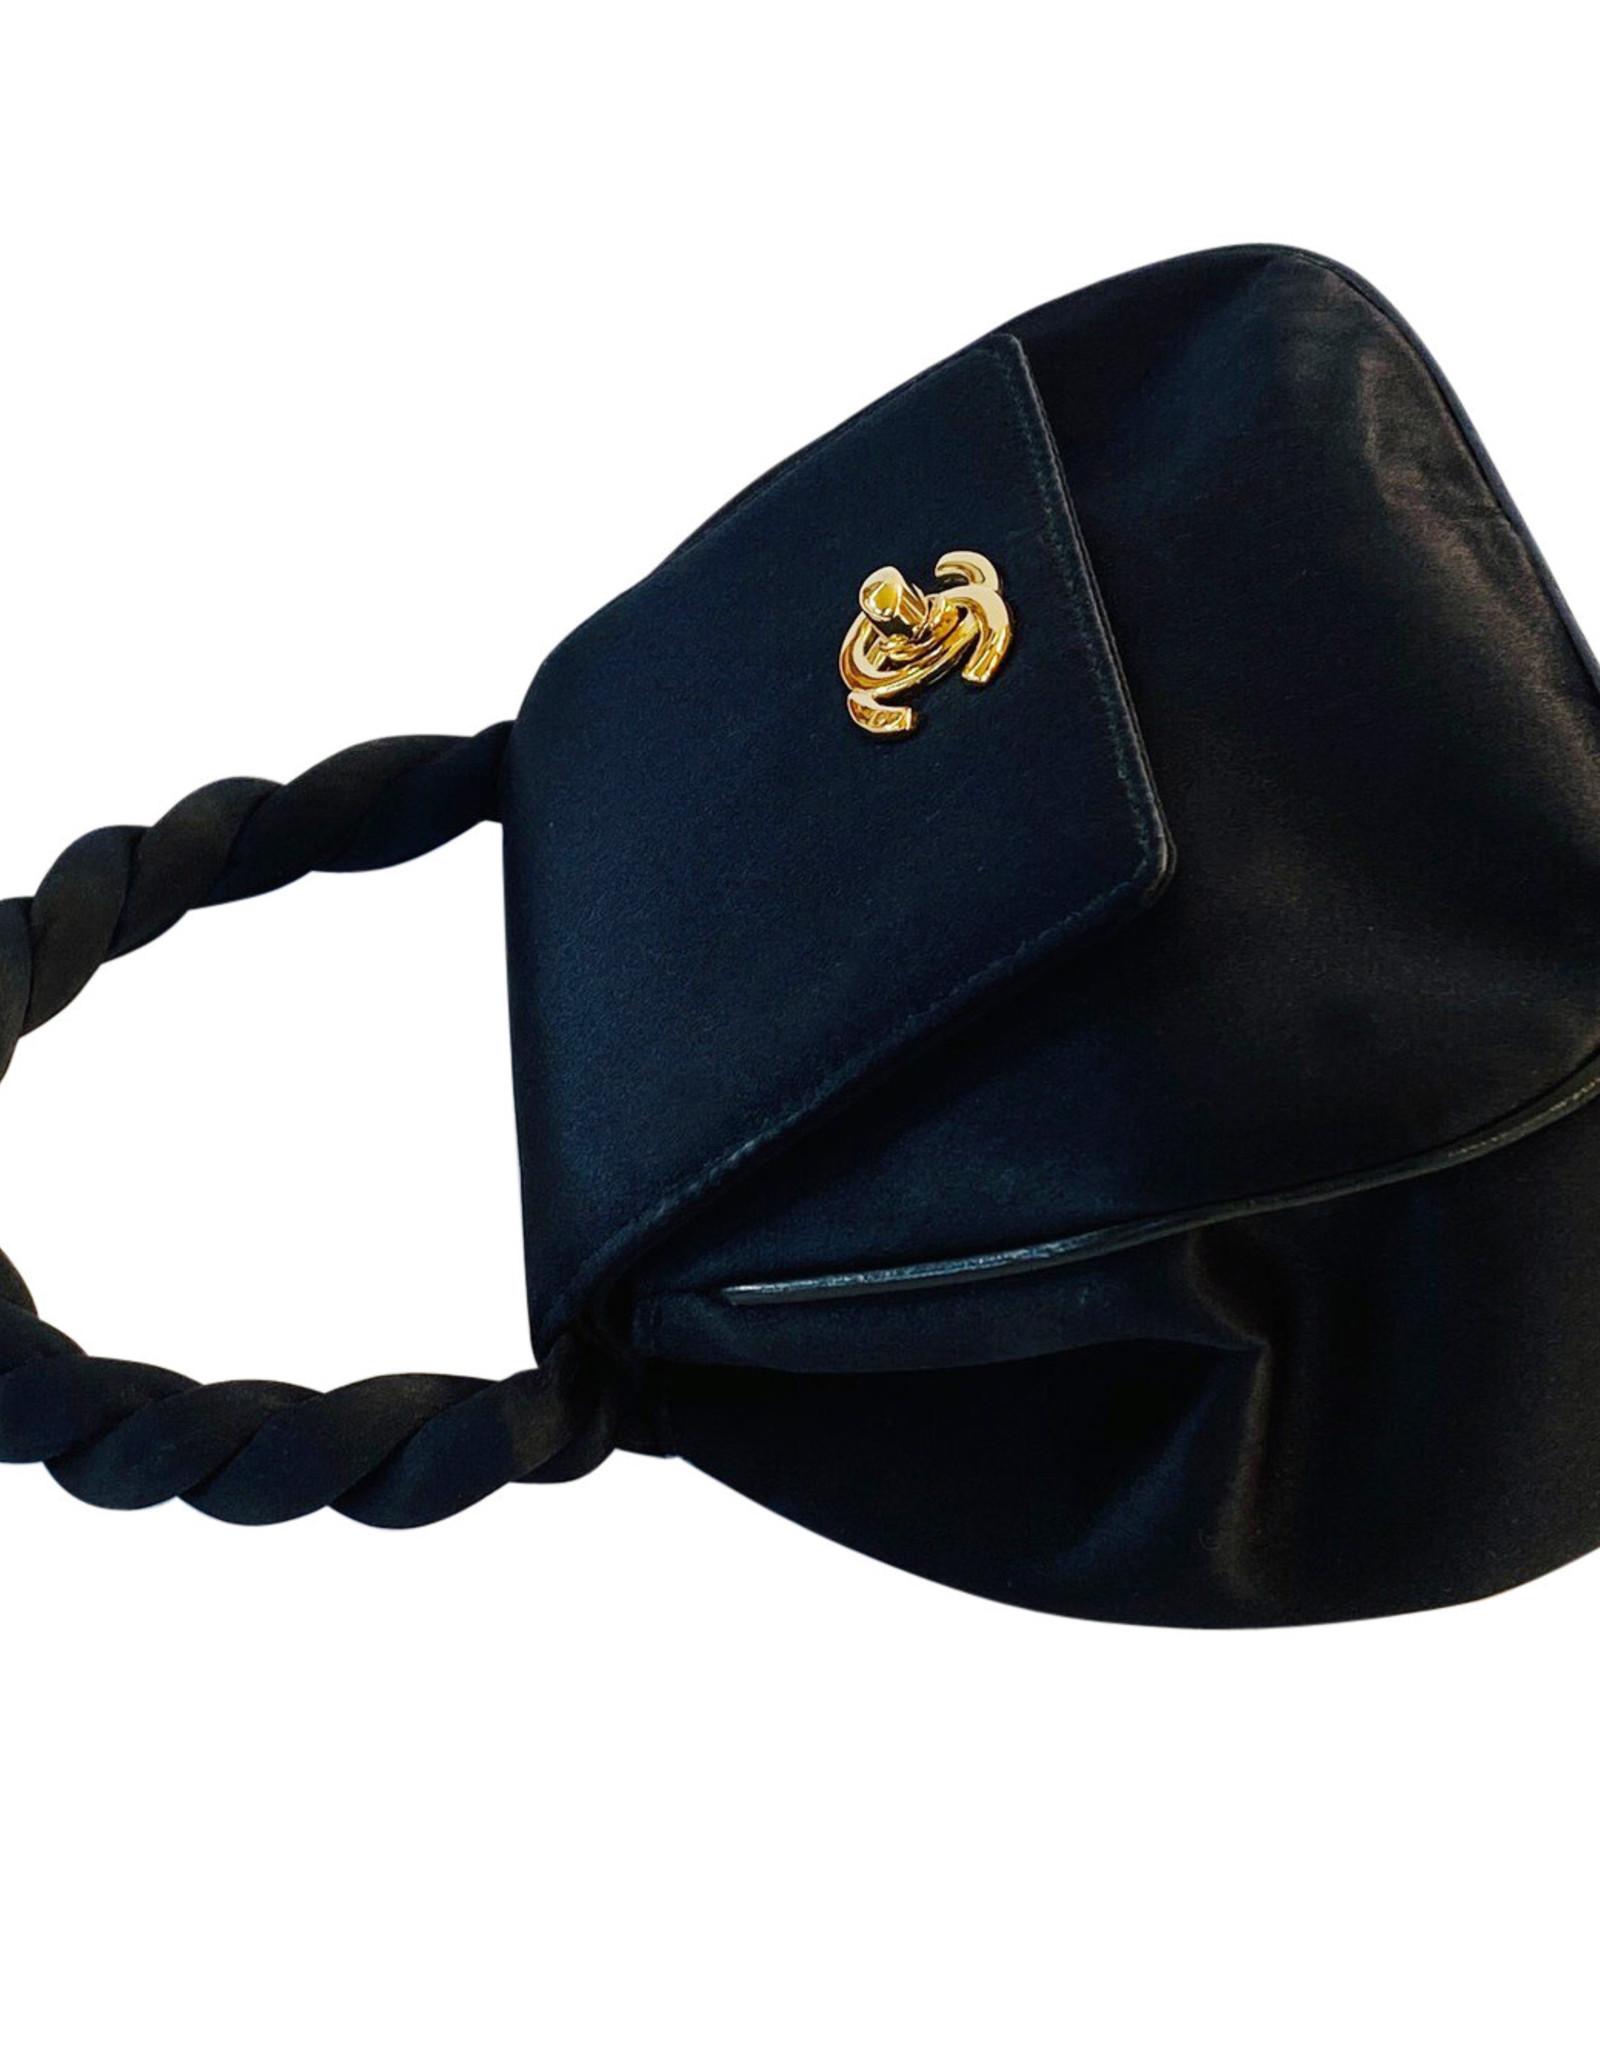 Chanel Chanel Satin Twist Bag (Vintage)